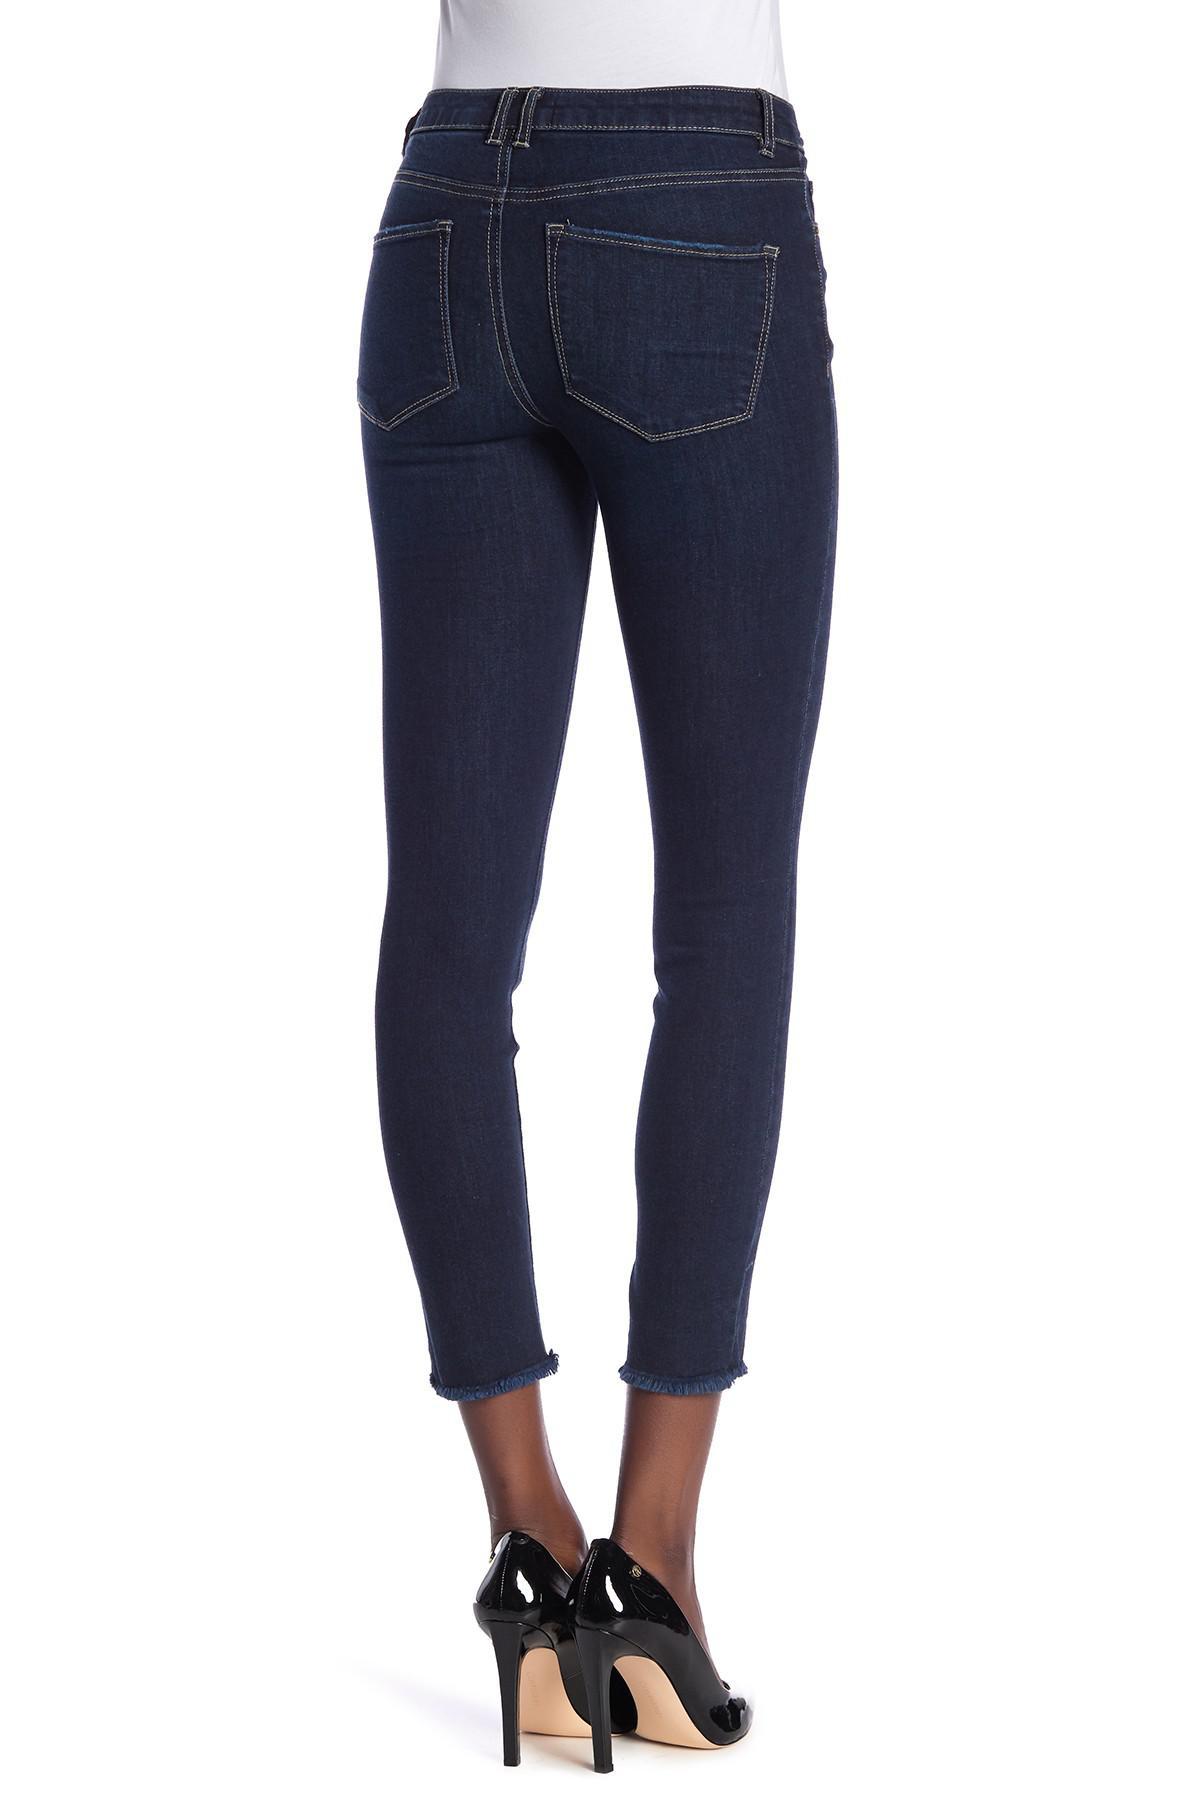 cec787acfda Jolt - Blue Fray Hem Skinny Jeans (juniors) - Lyst. View fullscreen